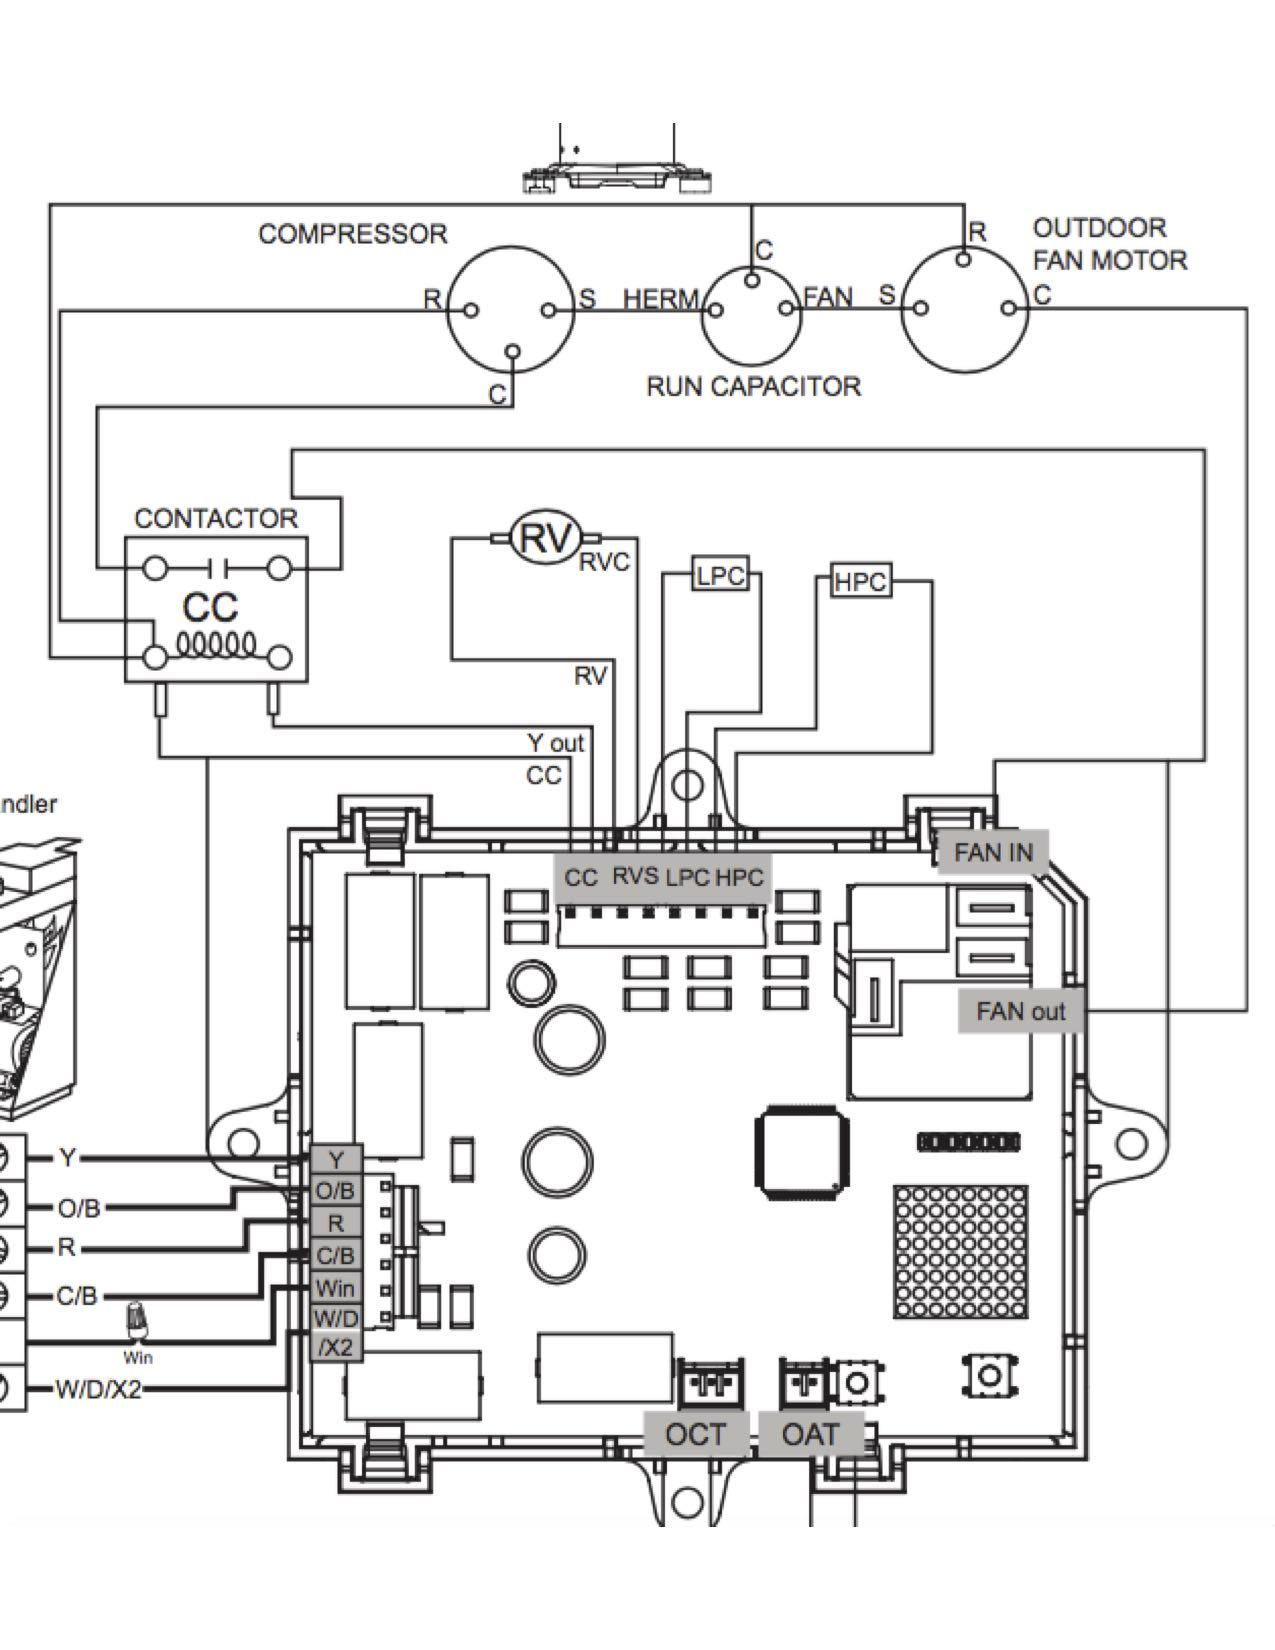 Honeywell Zone Control Wiring Diagram